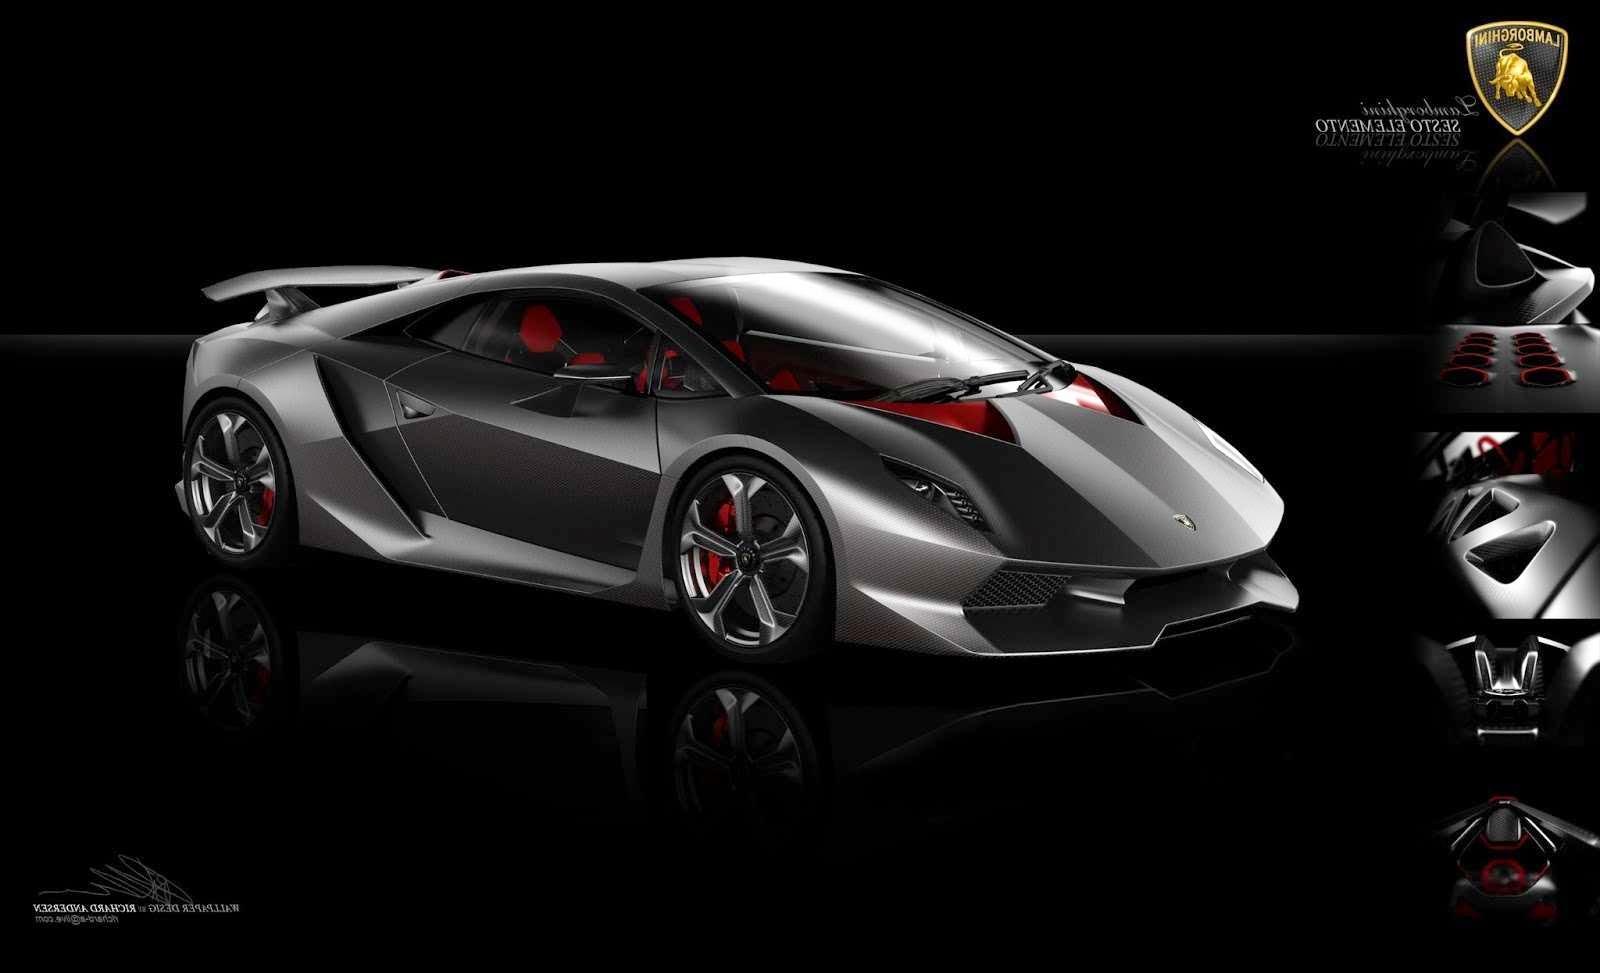 2013 Lamborghini Sesto Elemento Spyder wallpapers